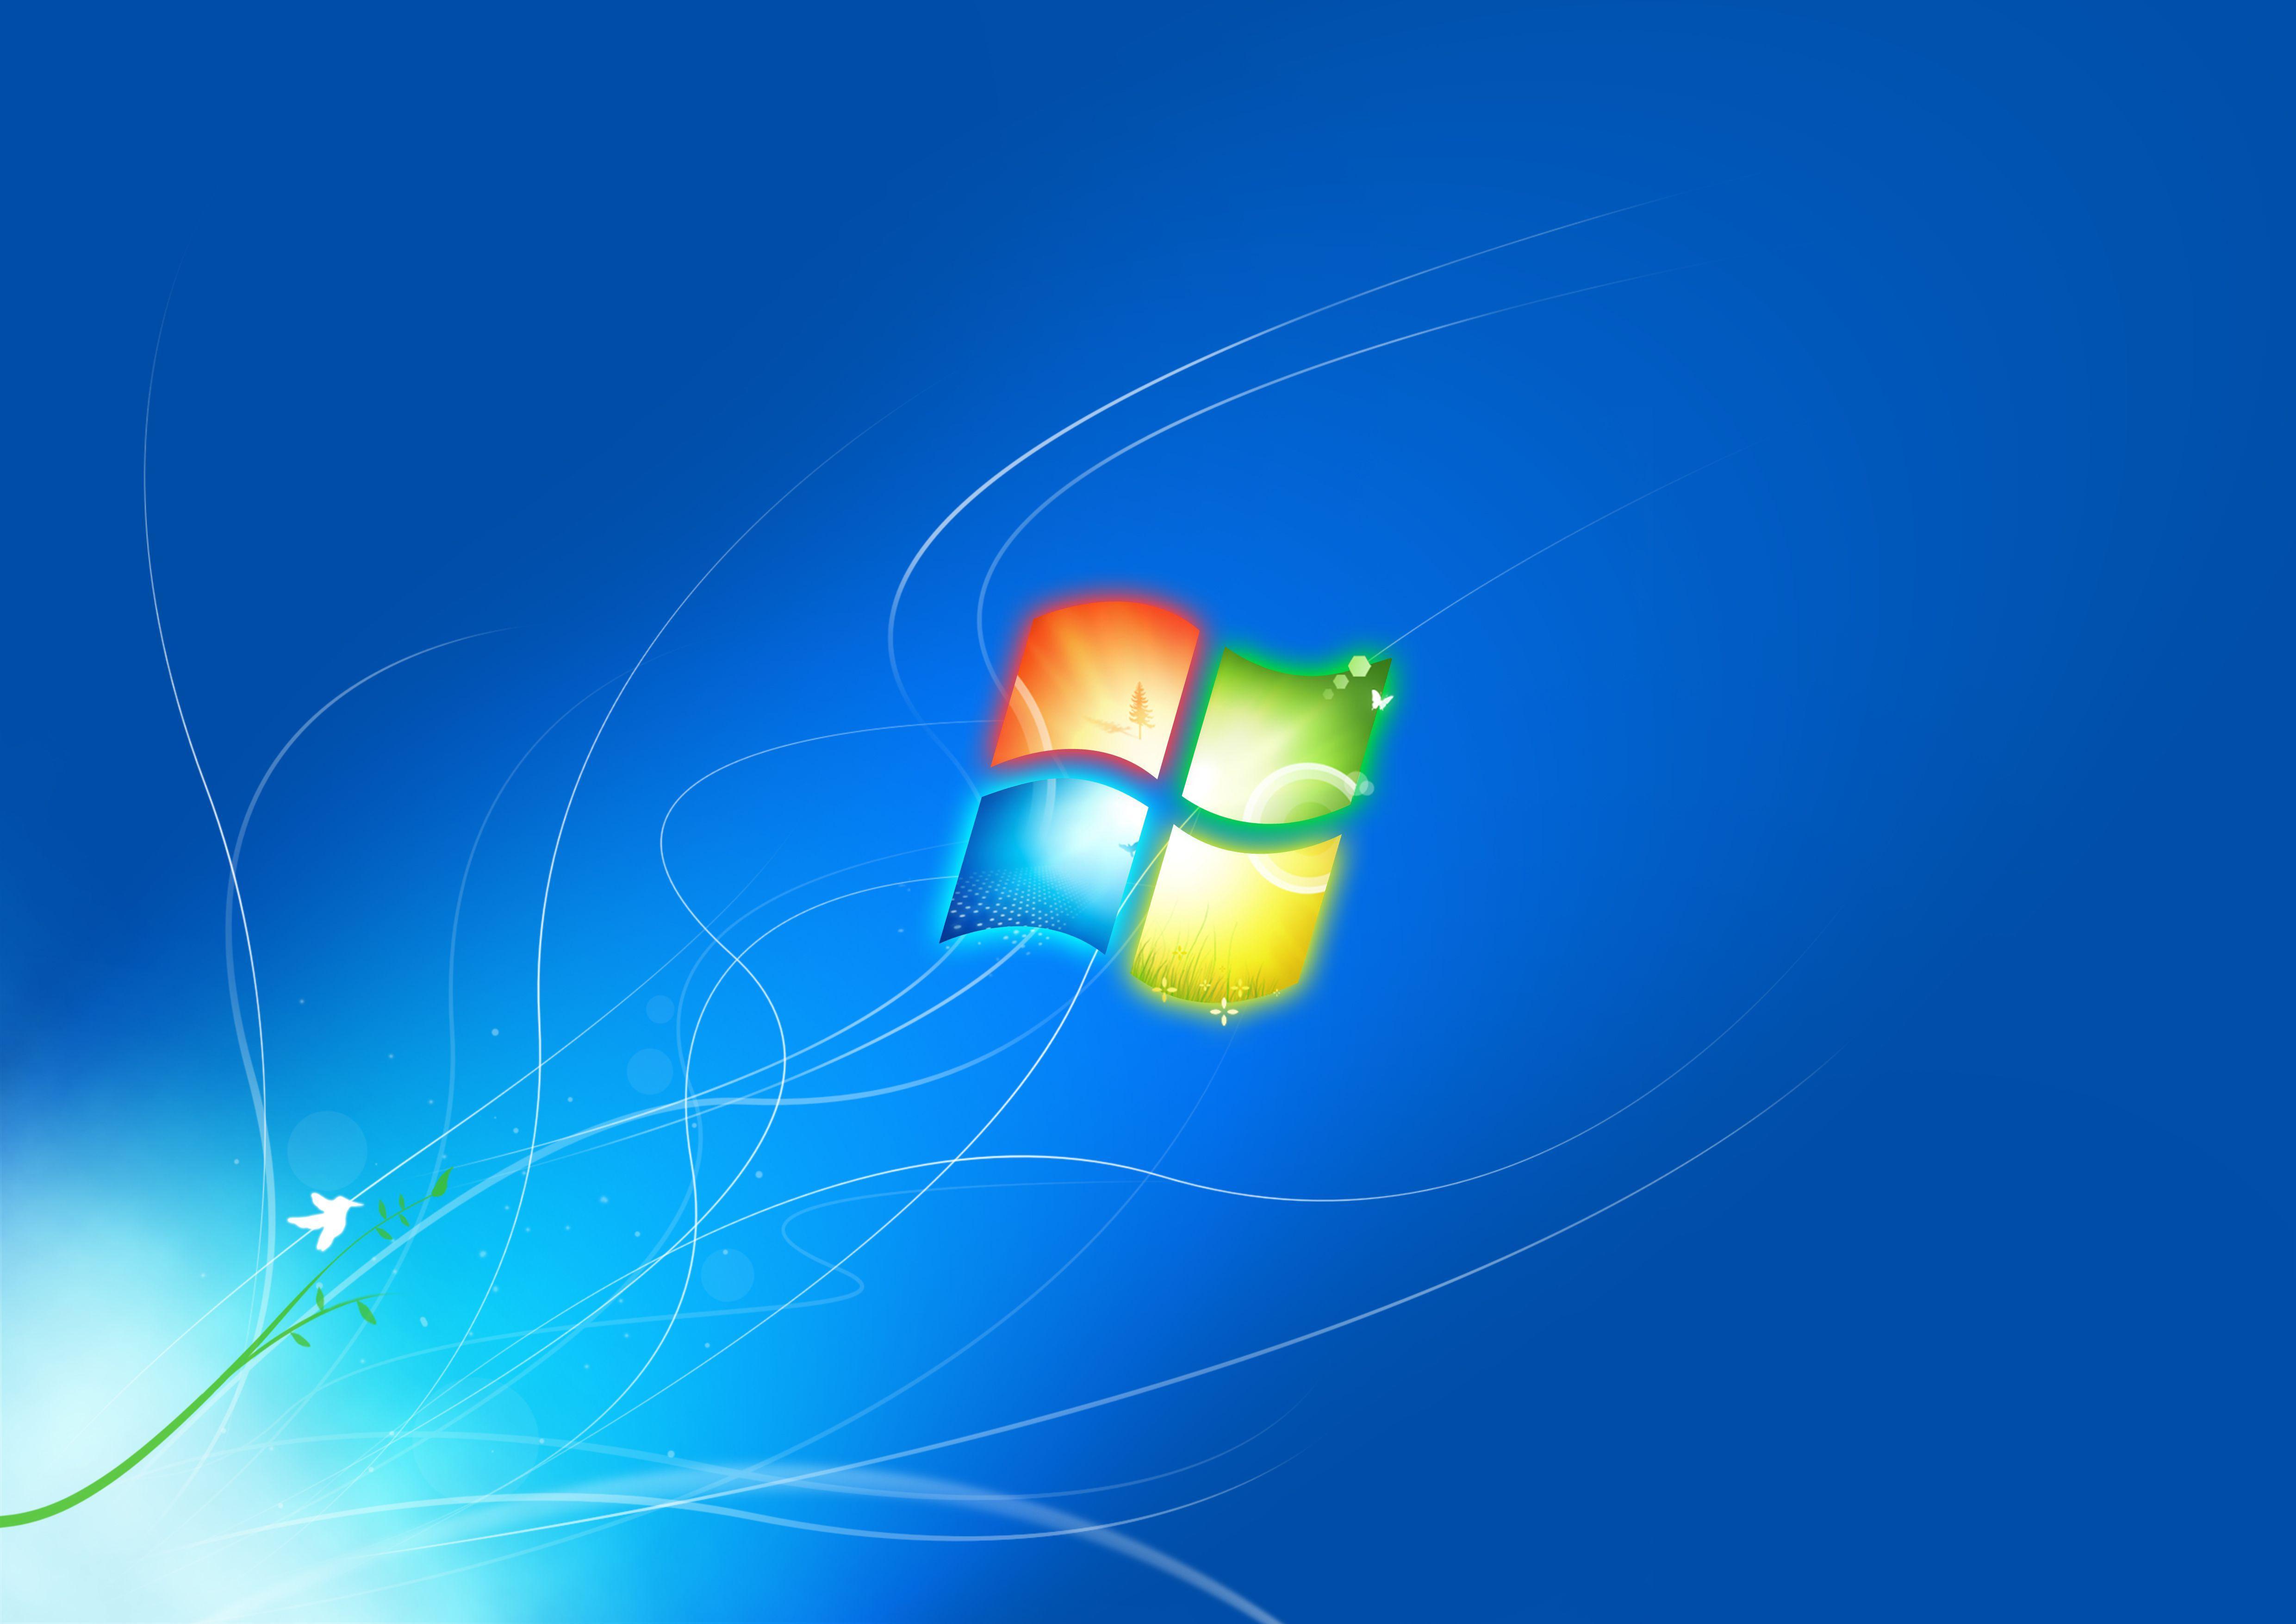 Original Windows 7 Wallpapers Top Free Original Windows 7 Backgrounds Wallpaperaccess